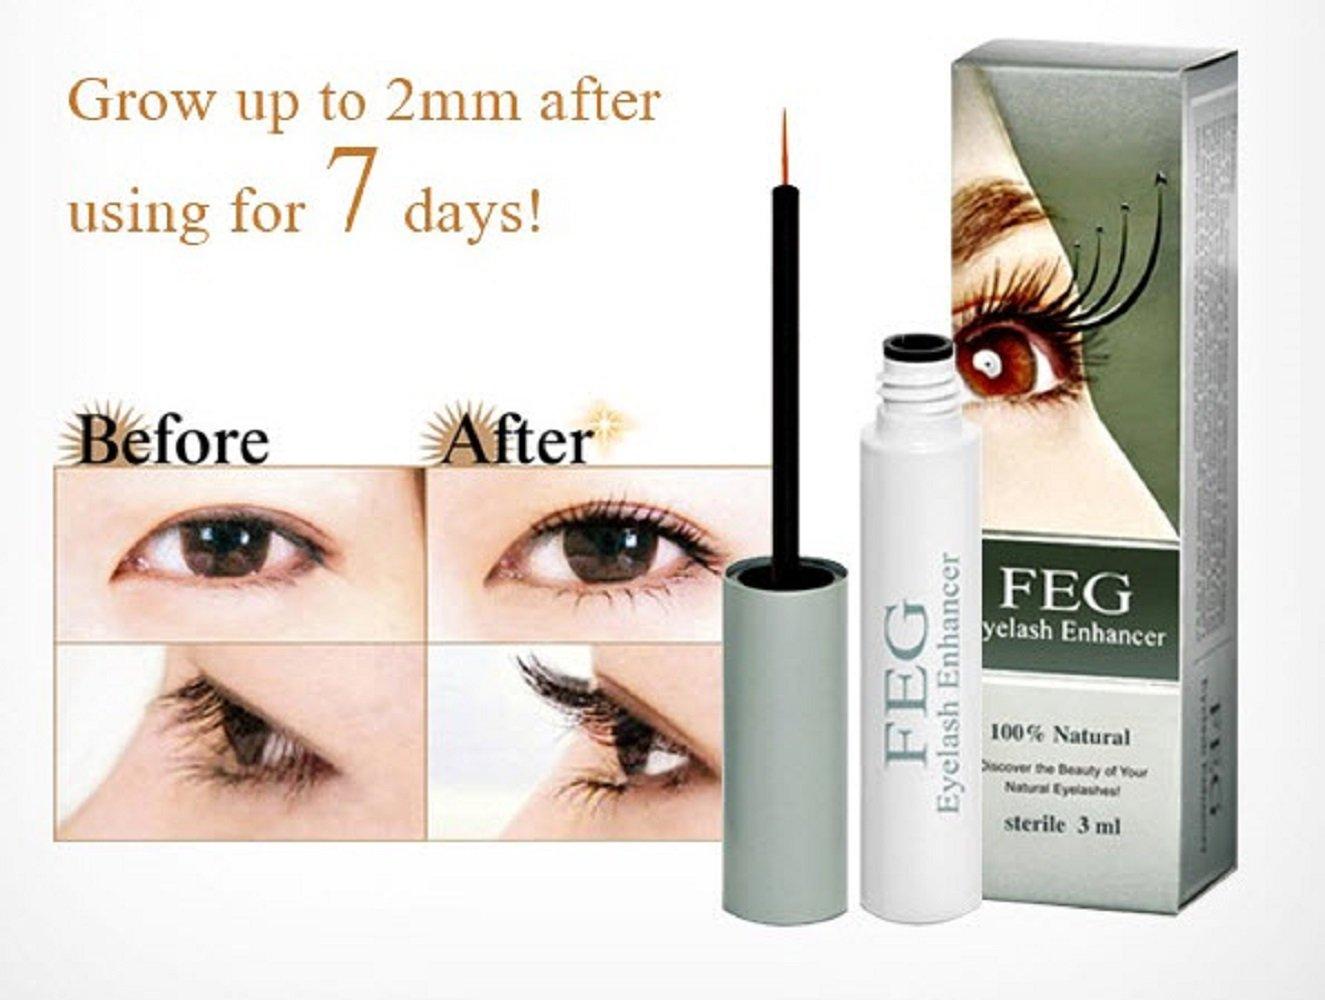 FEG Eyelash Enhancer Serum Content: 3 ml.